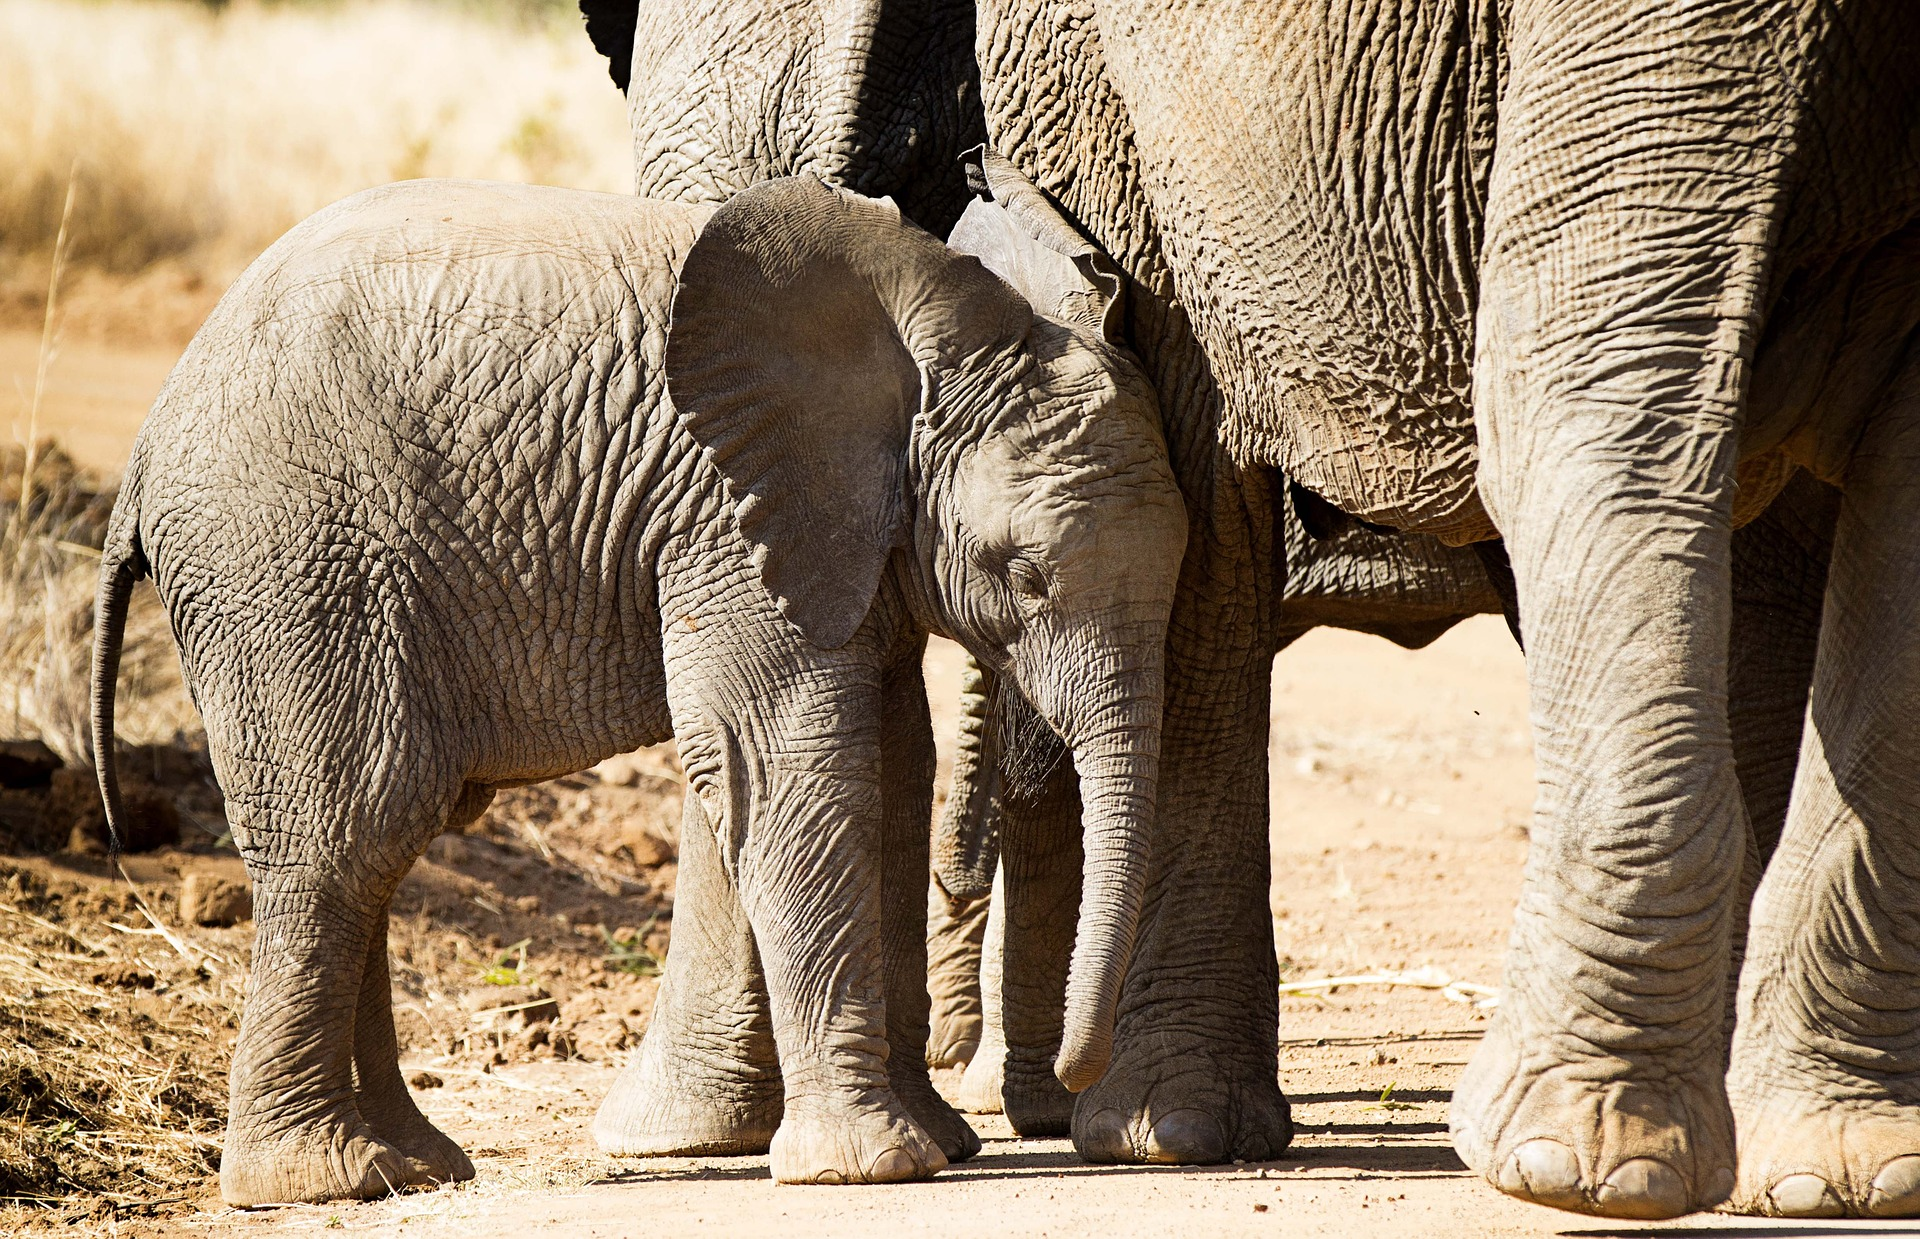 elephant-1169258_1920.jpg